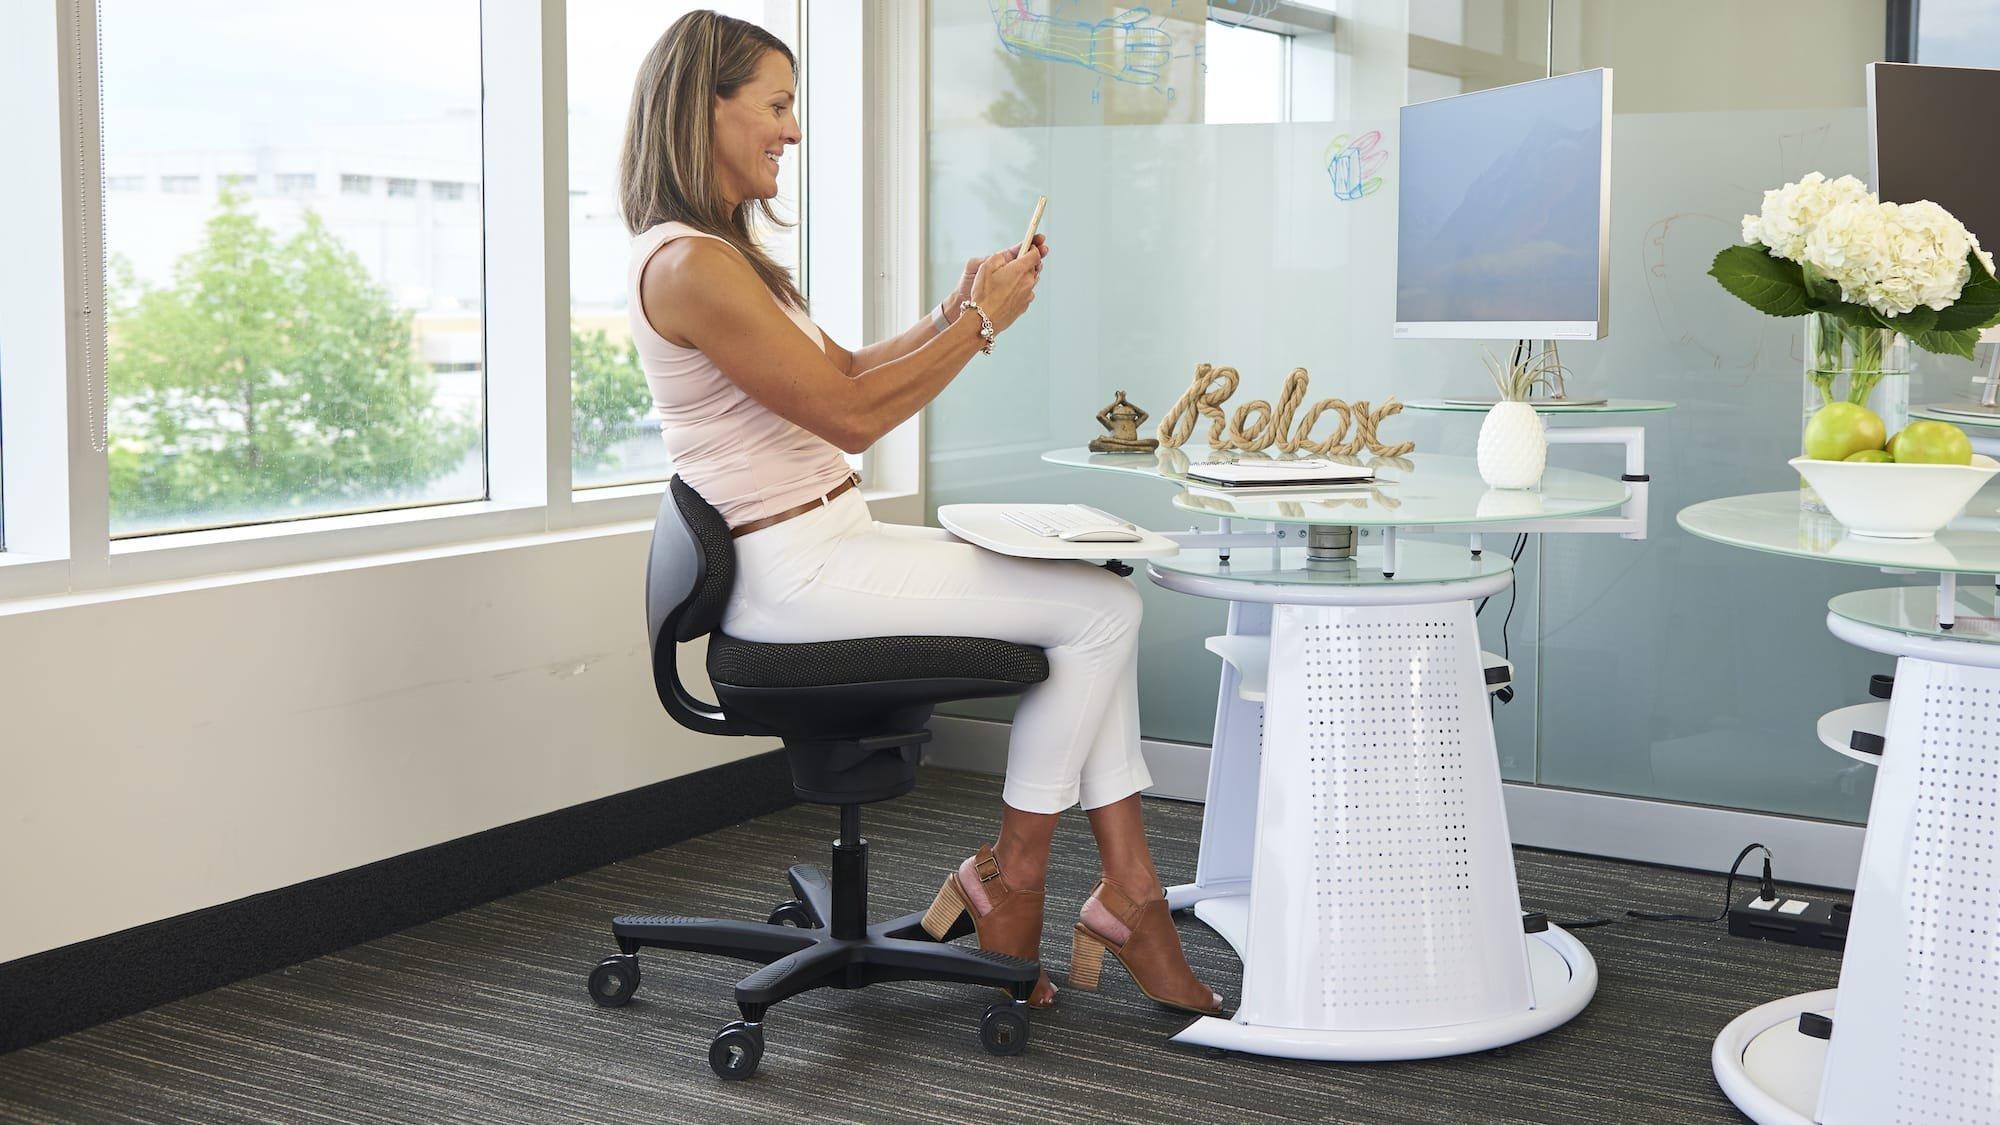 CoreChair active sitting desk chair promotes optimal sitting posture & encourages movement